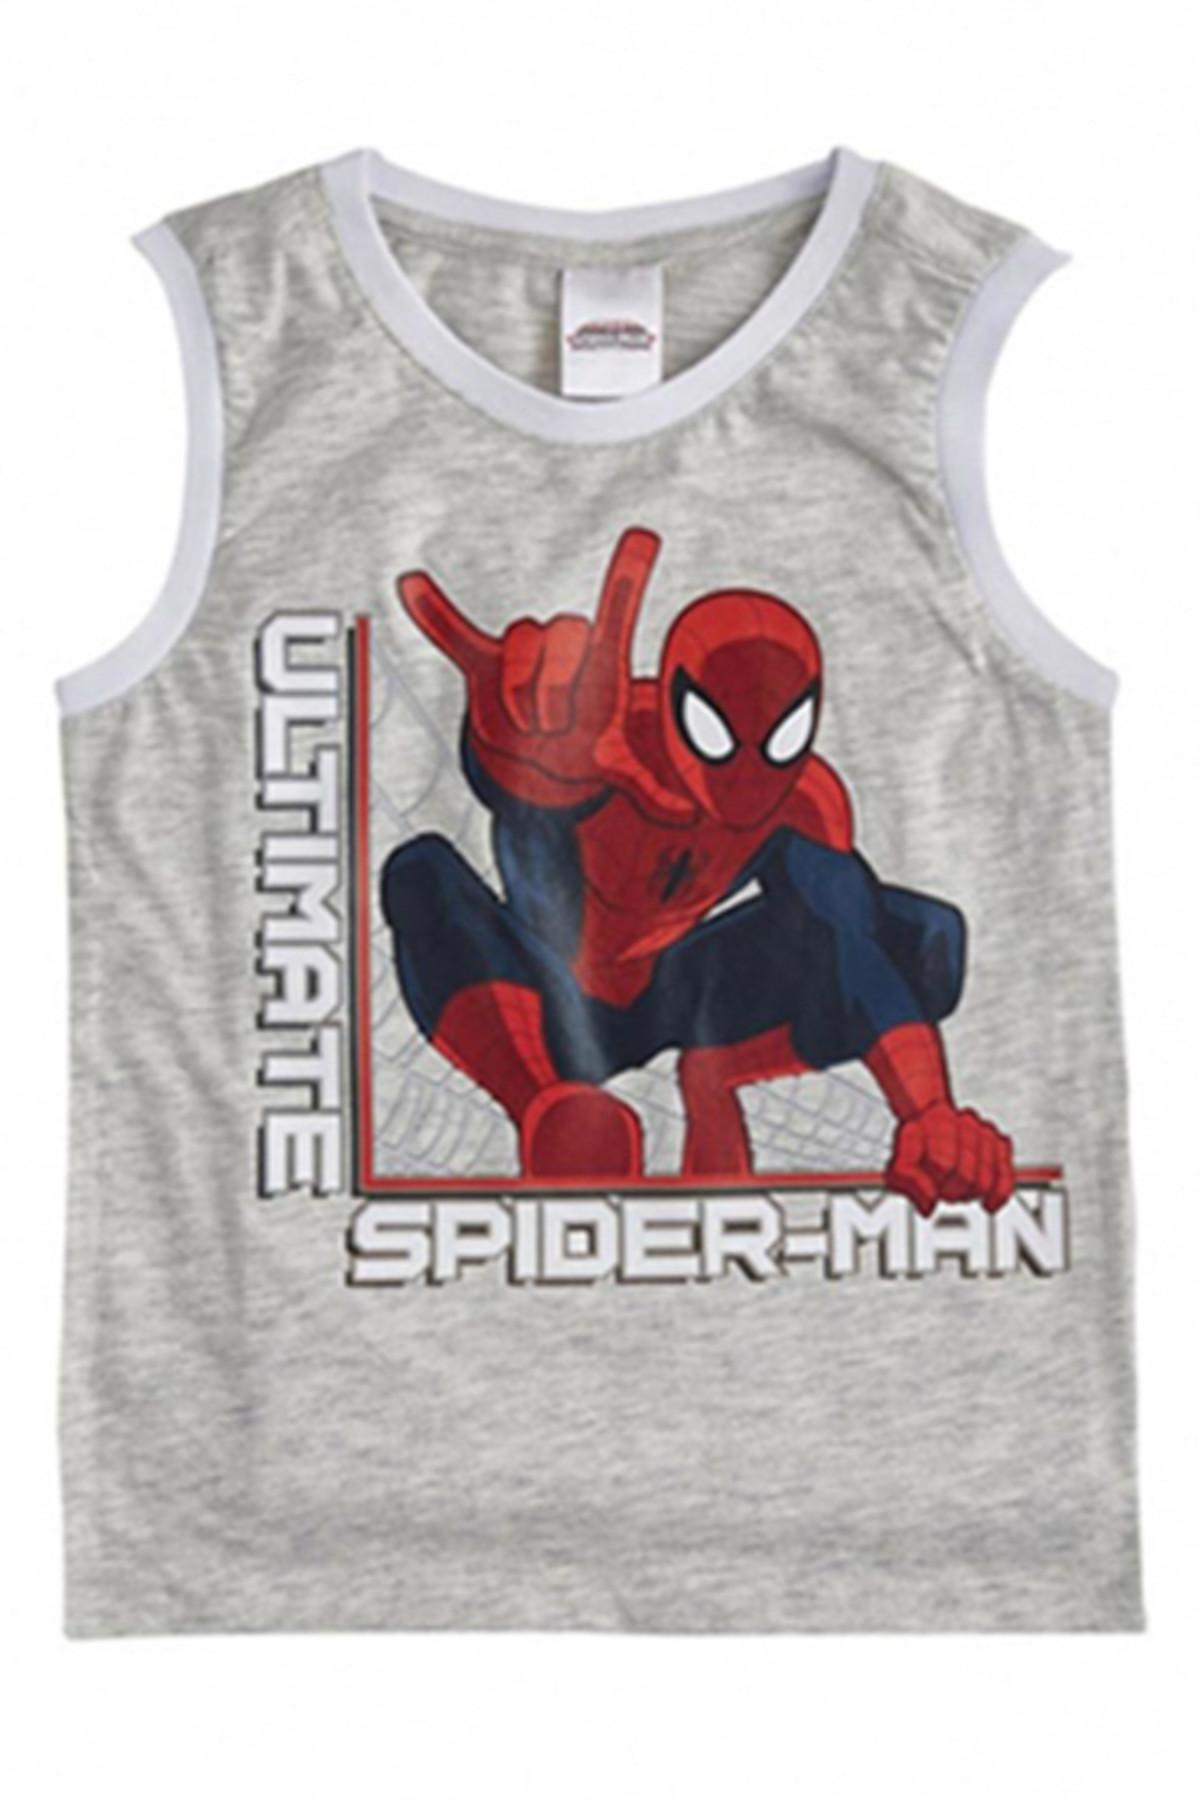 Soobe Lisanslı Ultimate Spider -Man Kolsuz T-Shirt Açık Gri Melanj   15YECATL1318_00-0004 1